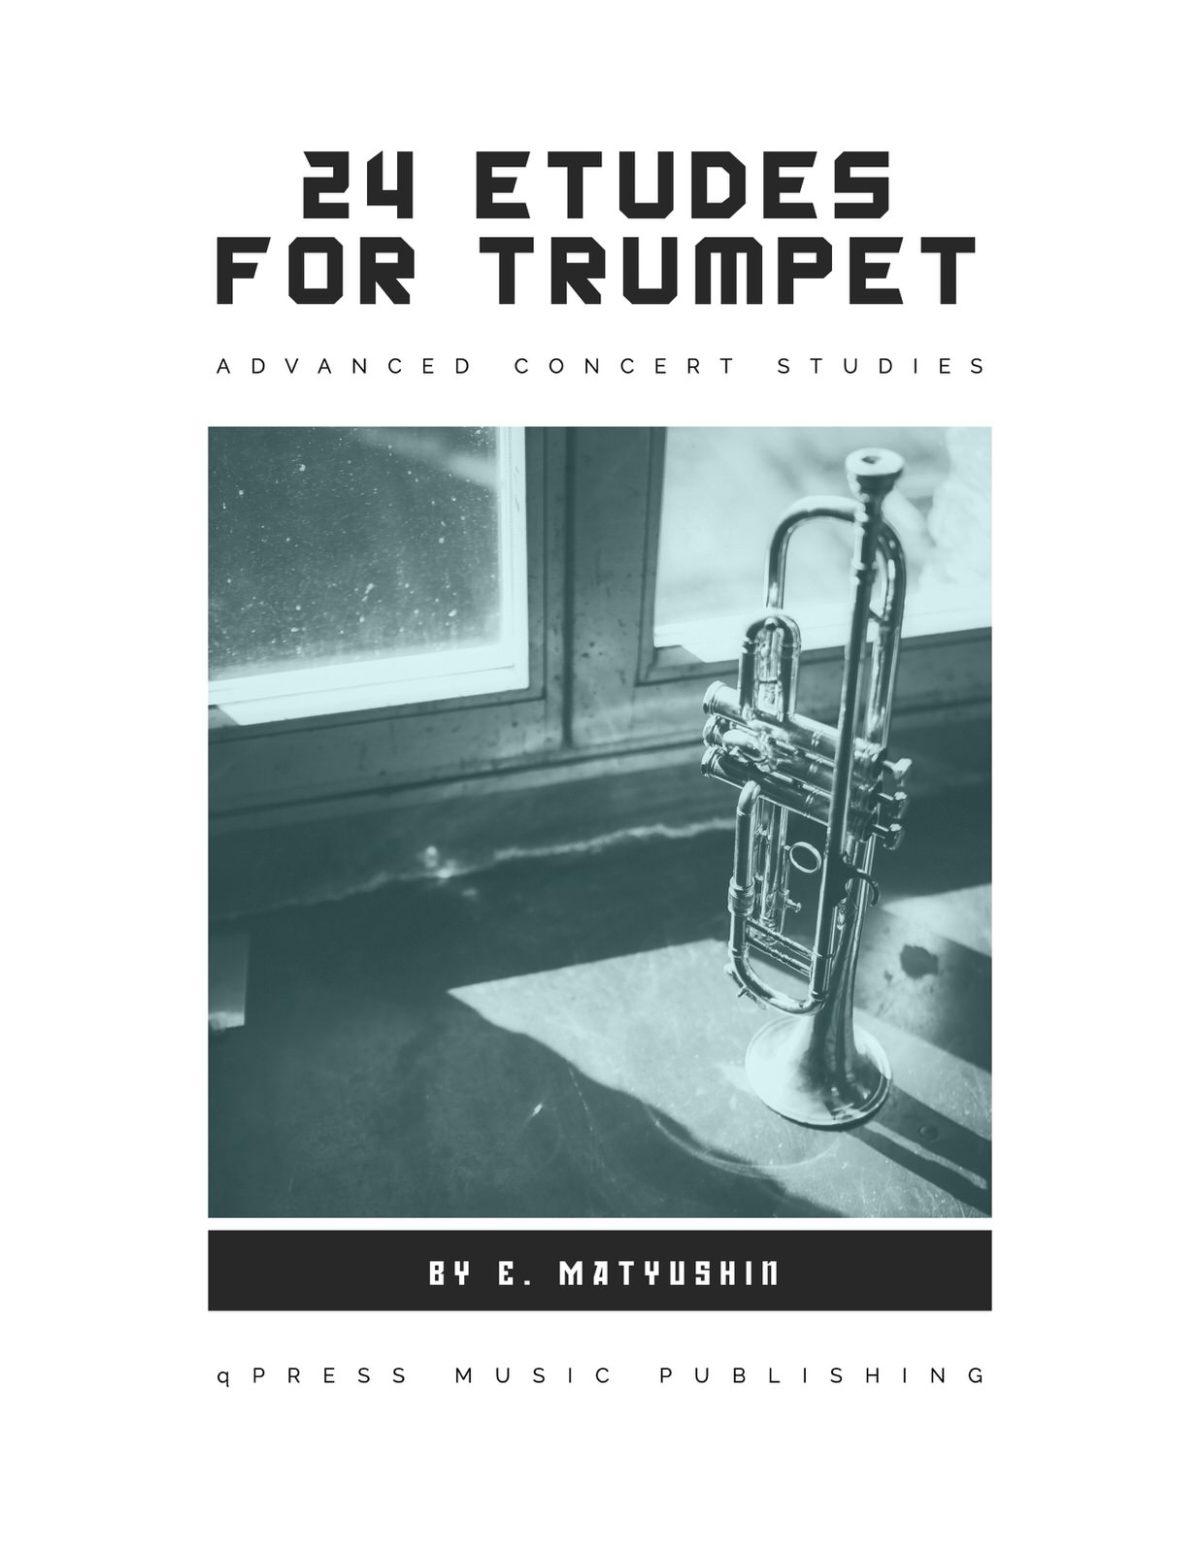 Matiushin, 24 Etudes for Trumpet-p01-1